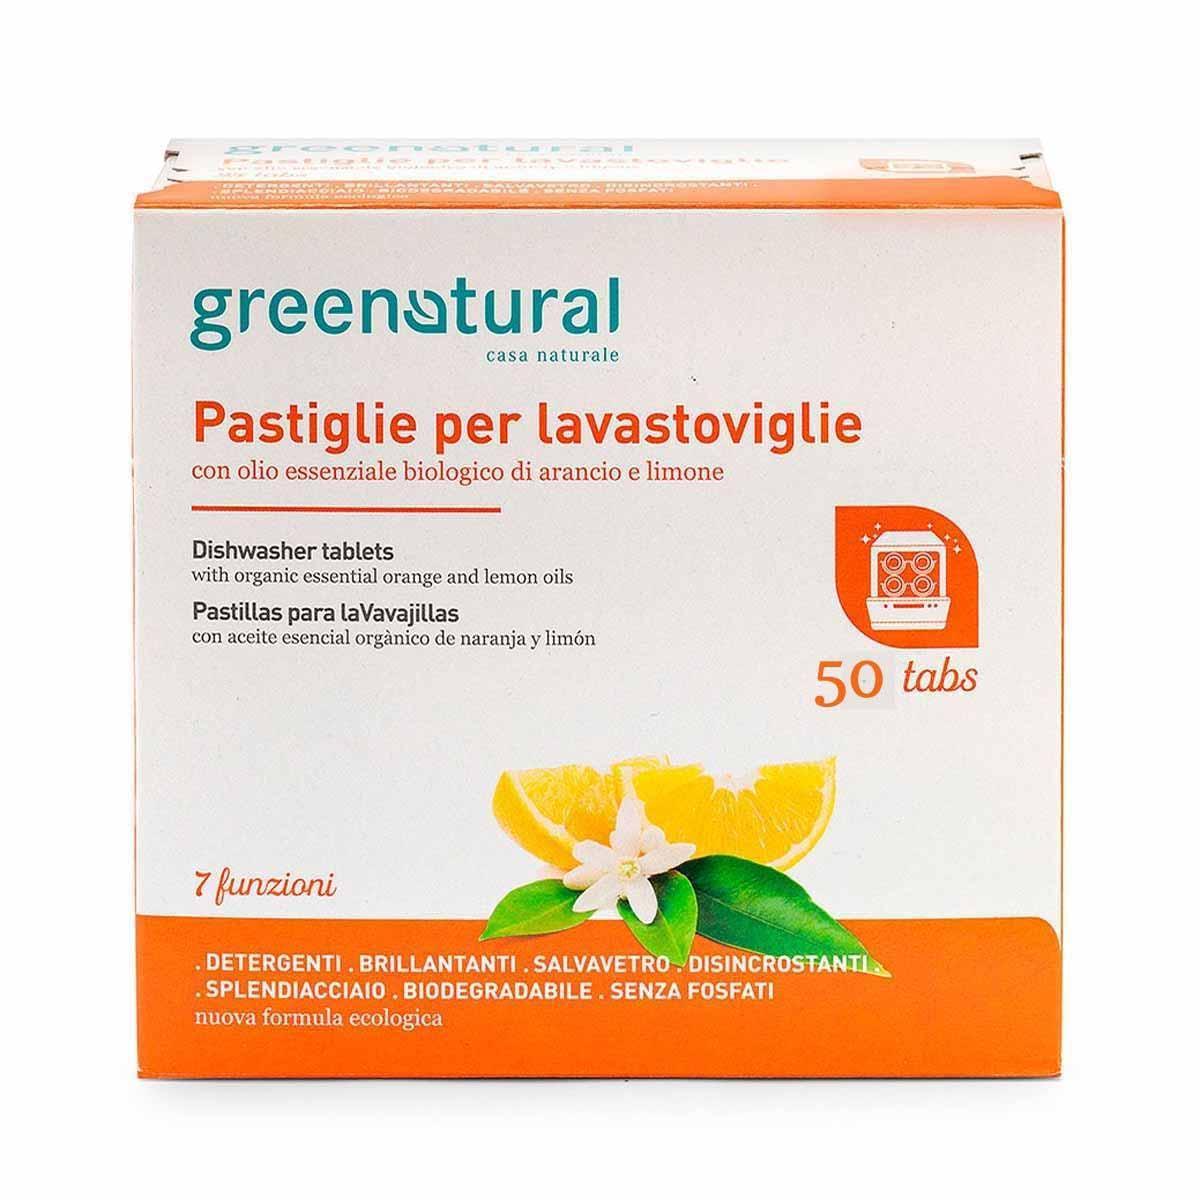 Greenatural – Greentabs lavastoviglie Family 50pz